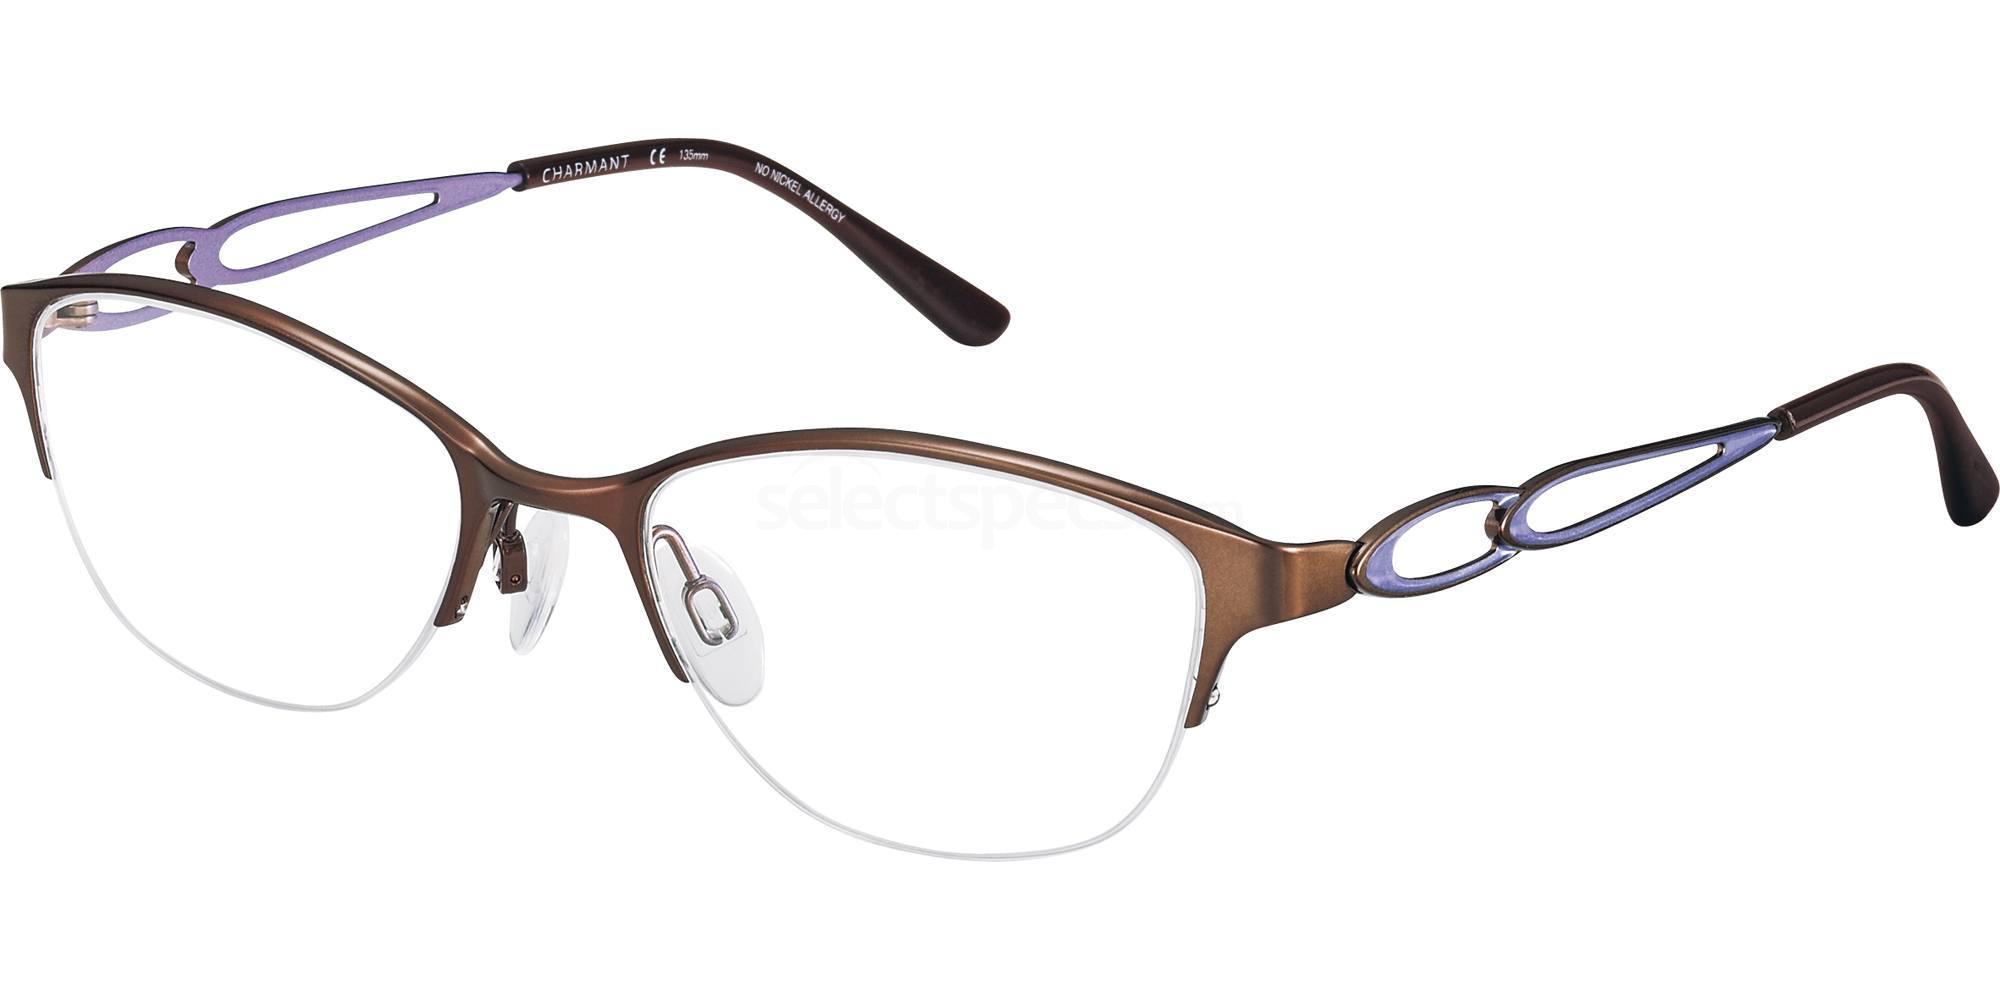 BR CH12118 Glasses, Charmant Titanium Perfection